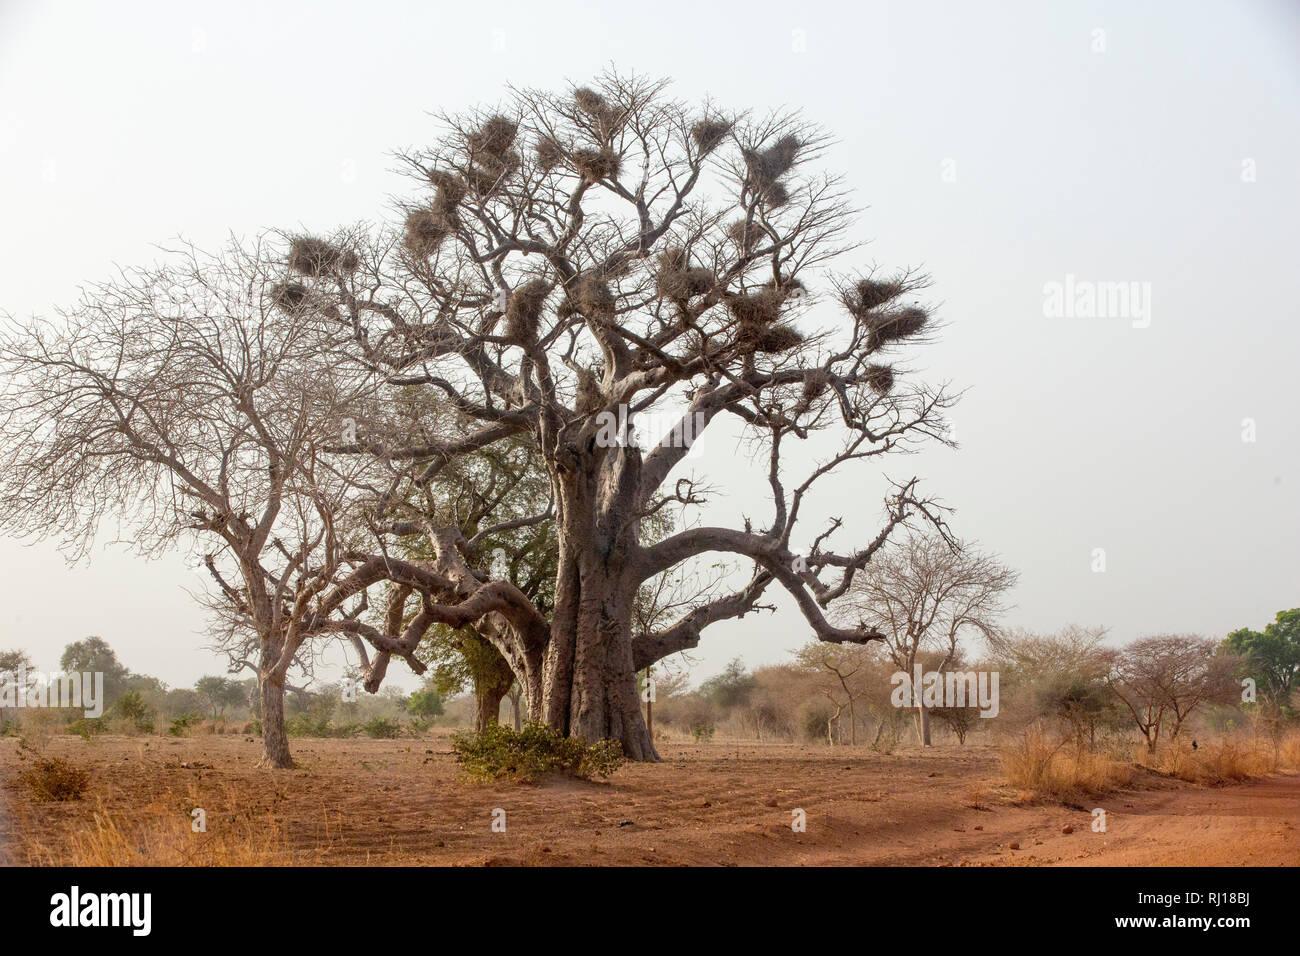 Yako Province, Burkina Faso; A baobab tree with bird nests on the road from Yako town to Samba. - Stock Image